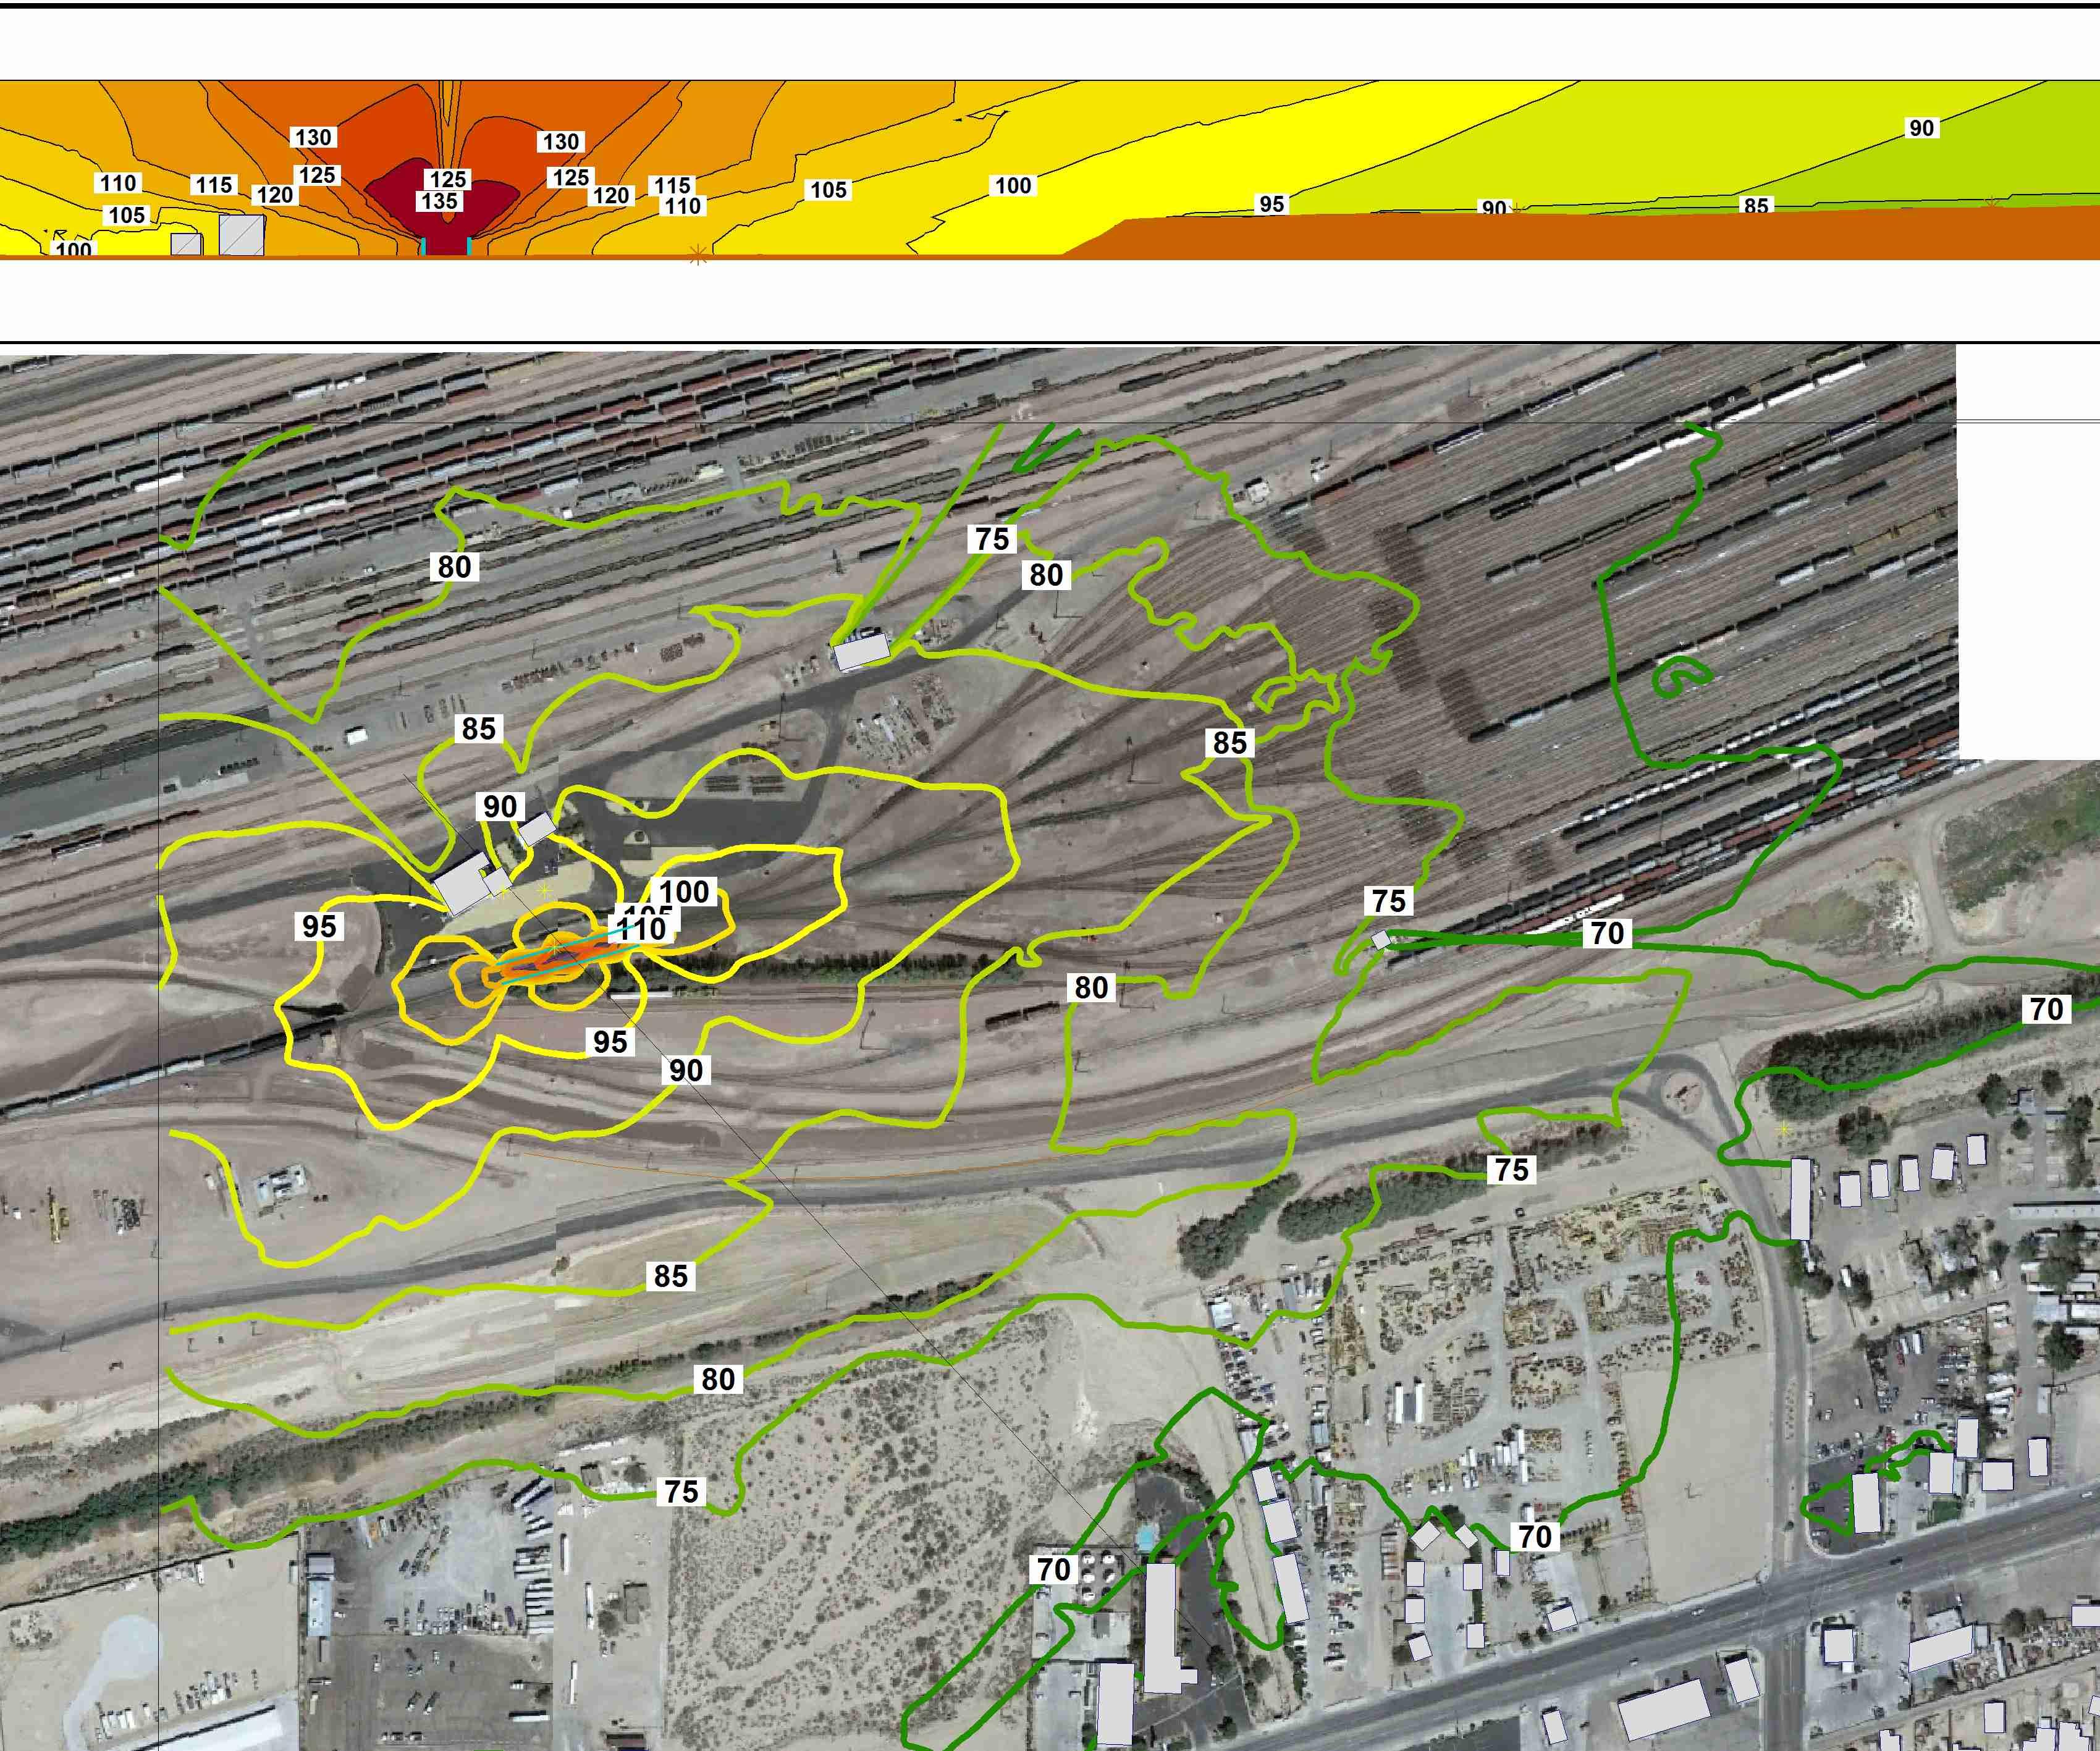 Leq_Contour_Map_ BarrierOptionA.jpg